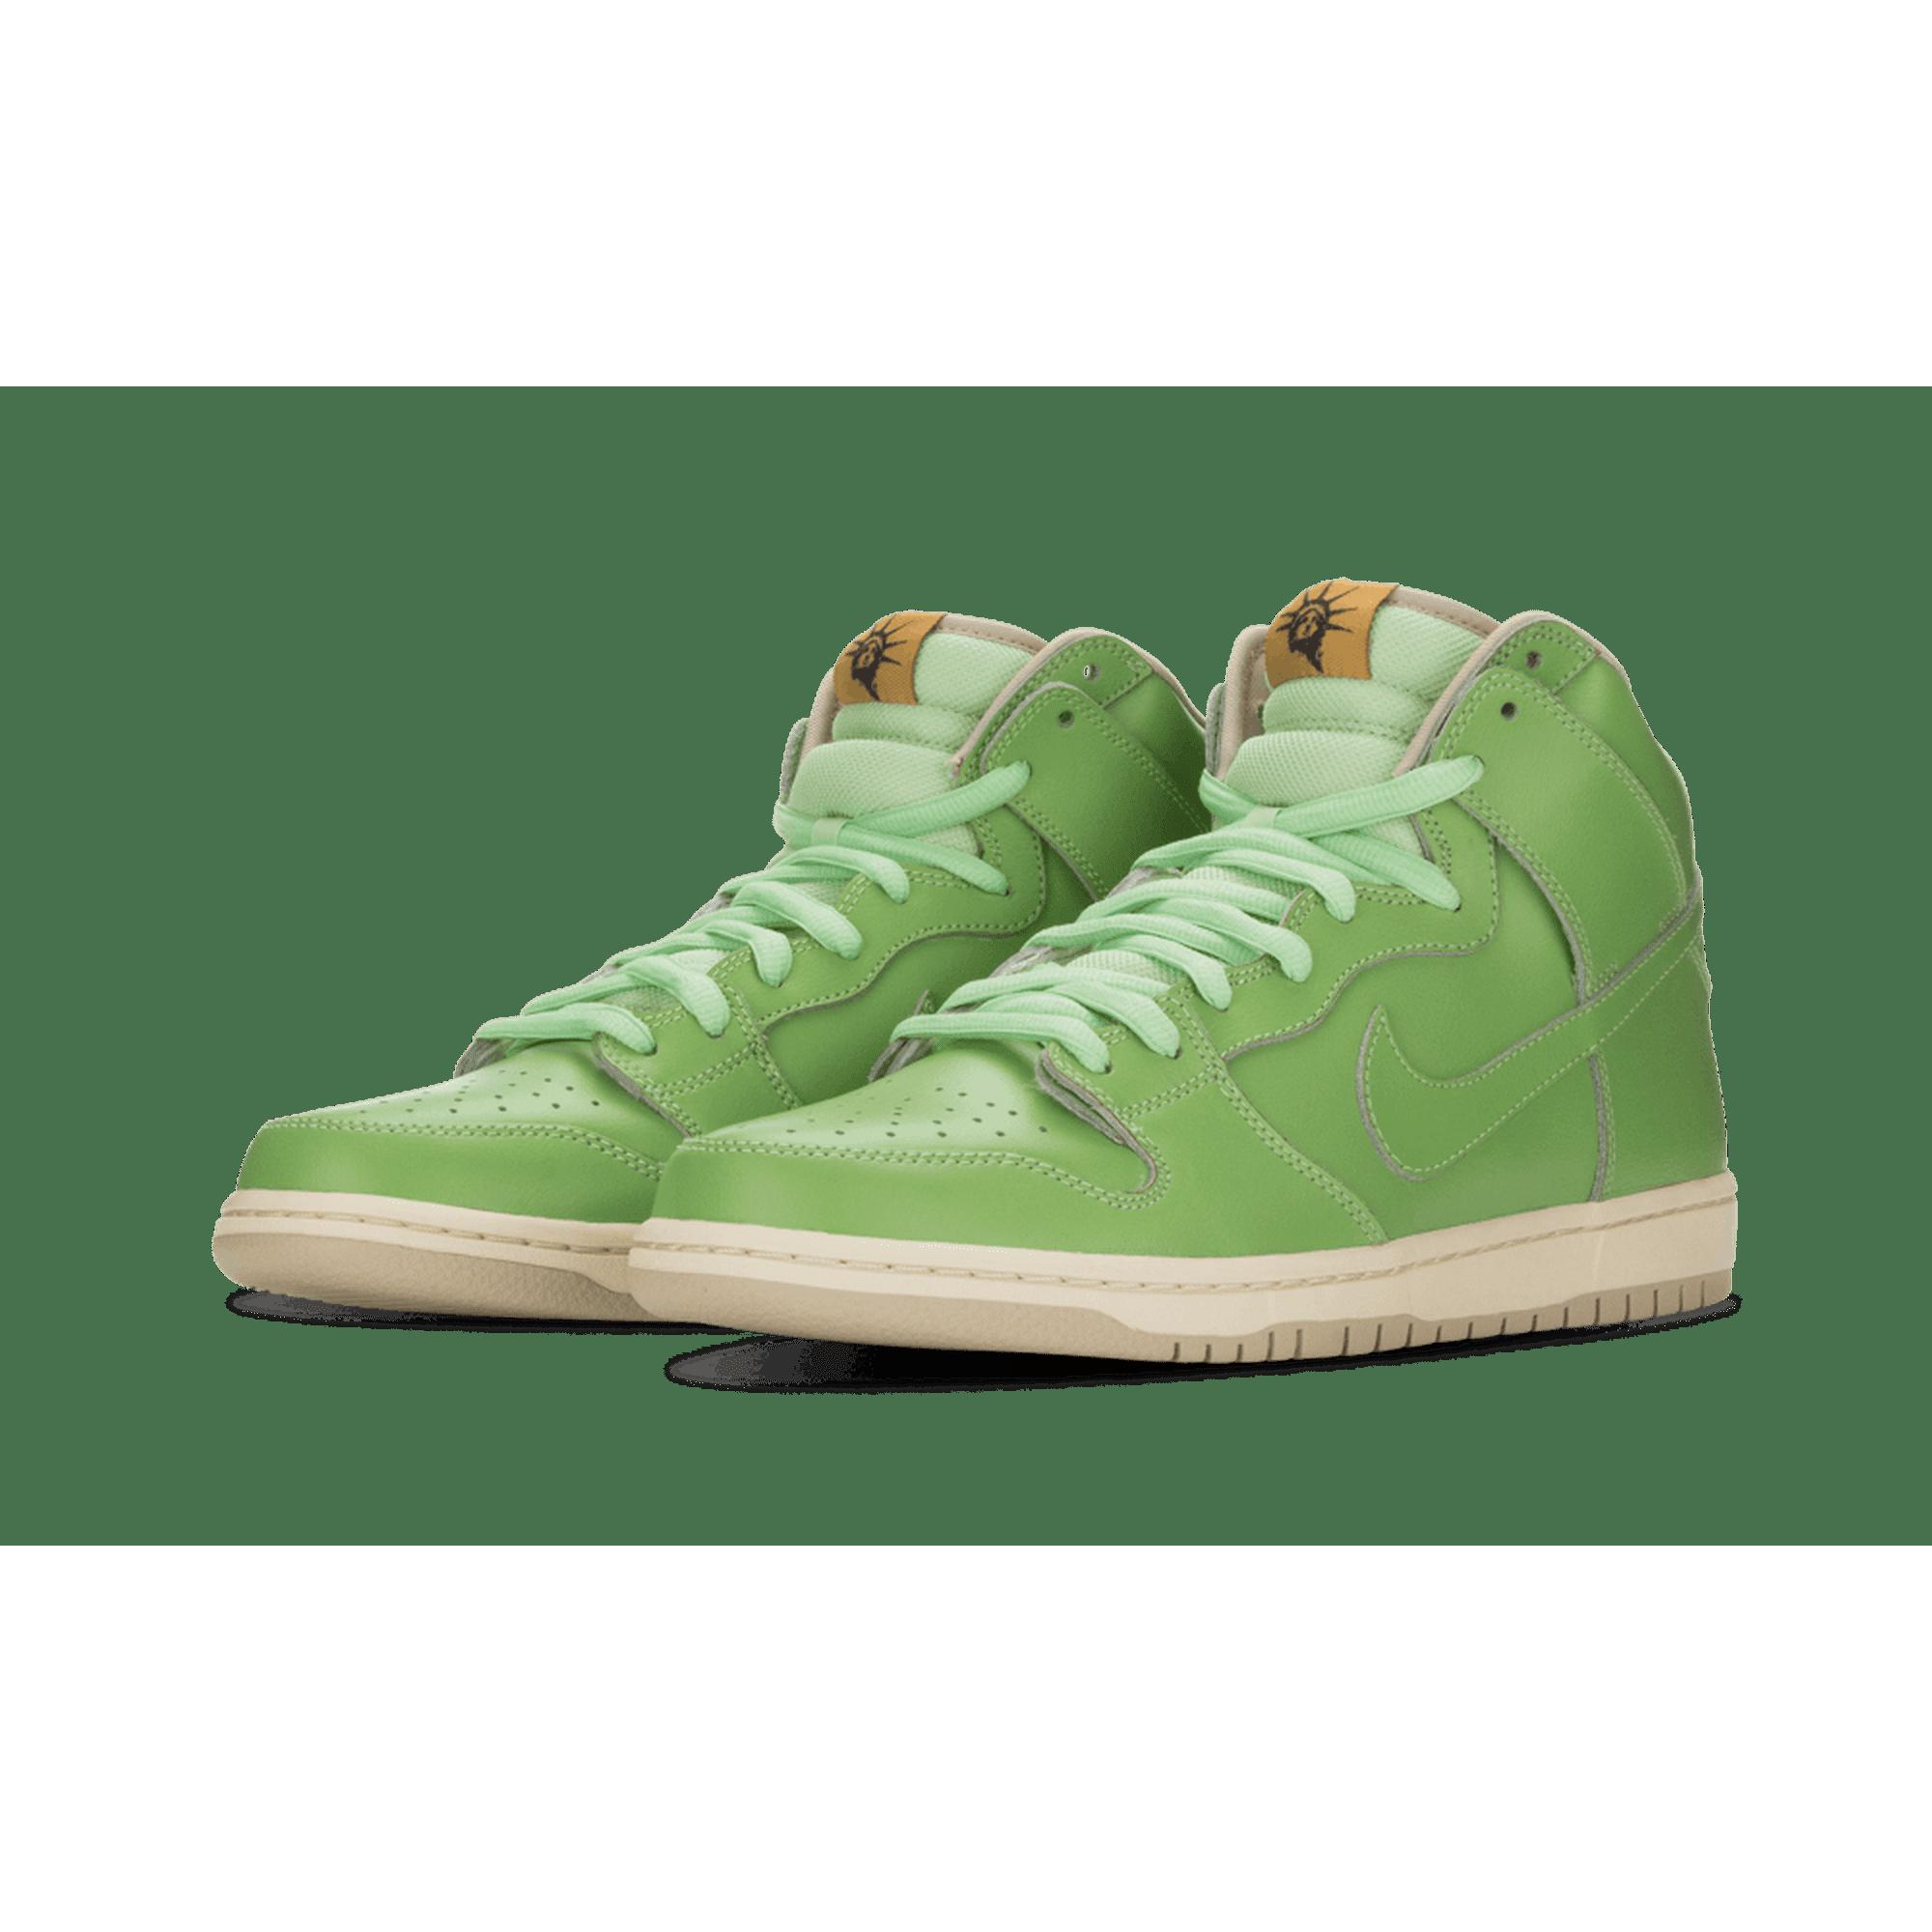 sneakers for cheap 5068d e709e Nike - Men - Dunk High Premium Sb 'Statue Of Liberty ...